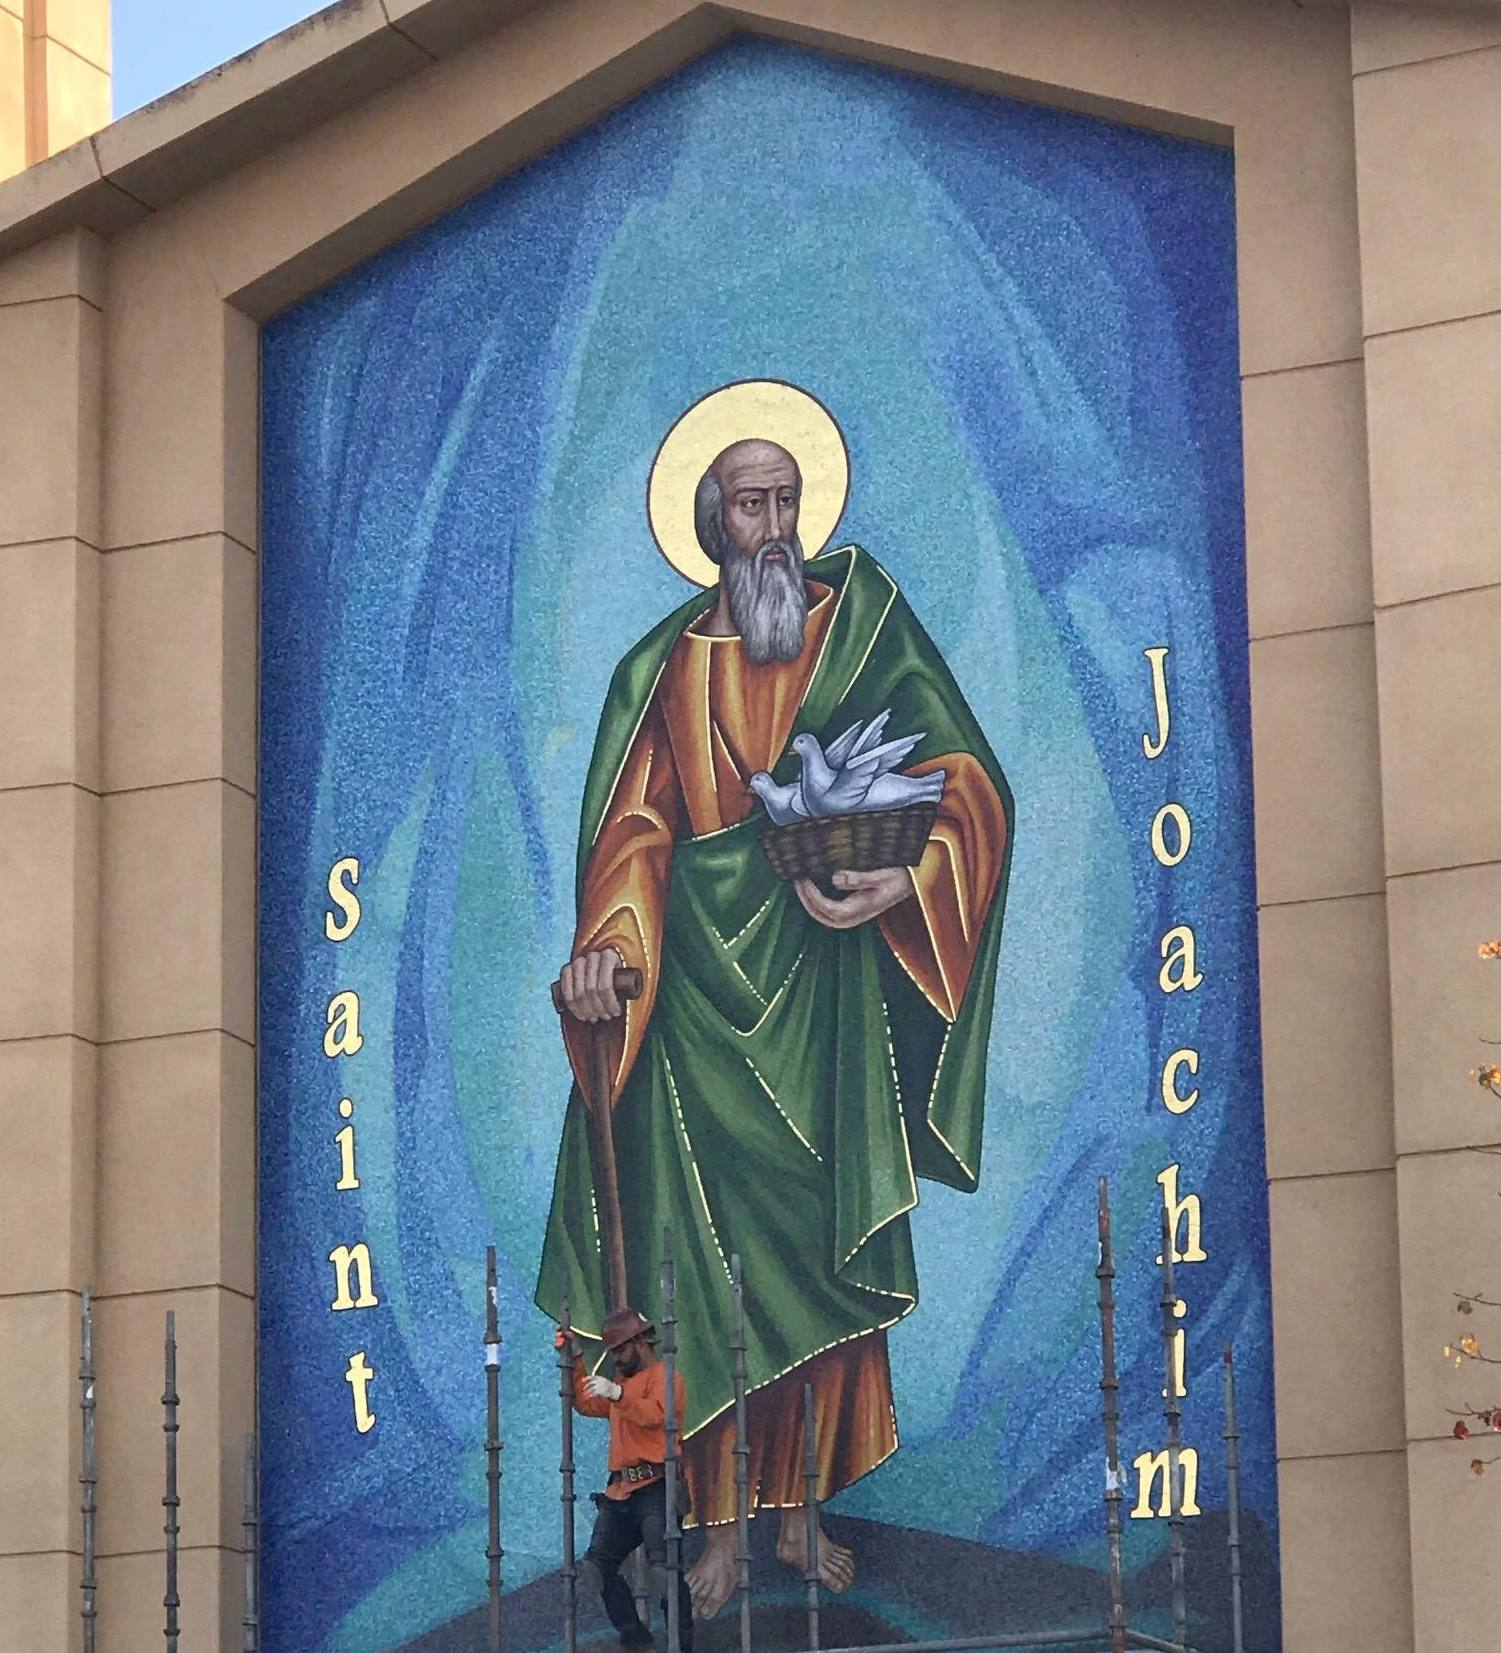 St. Joachim exterior mosaic